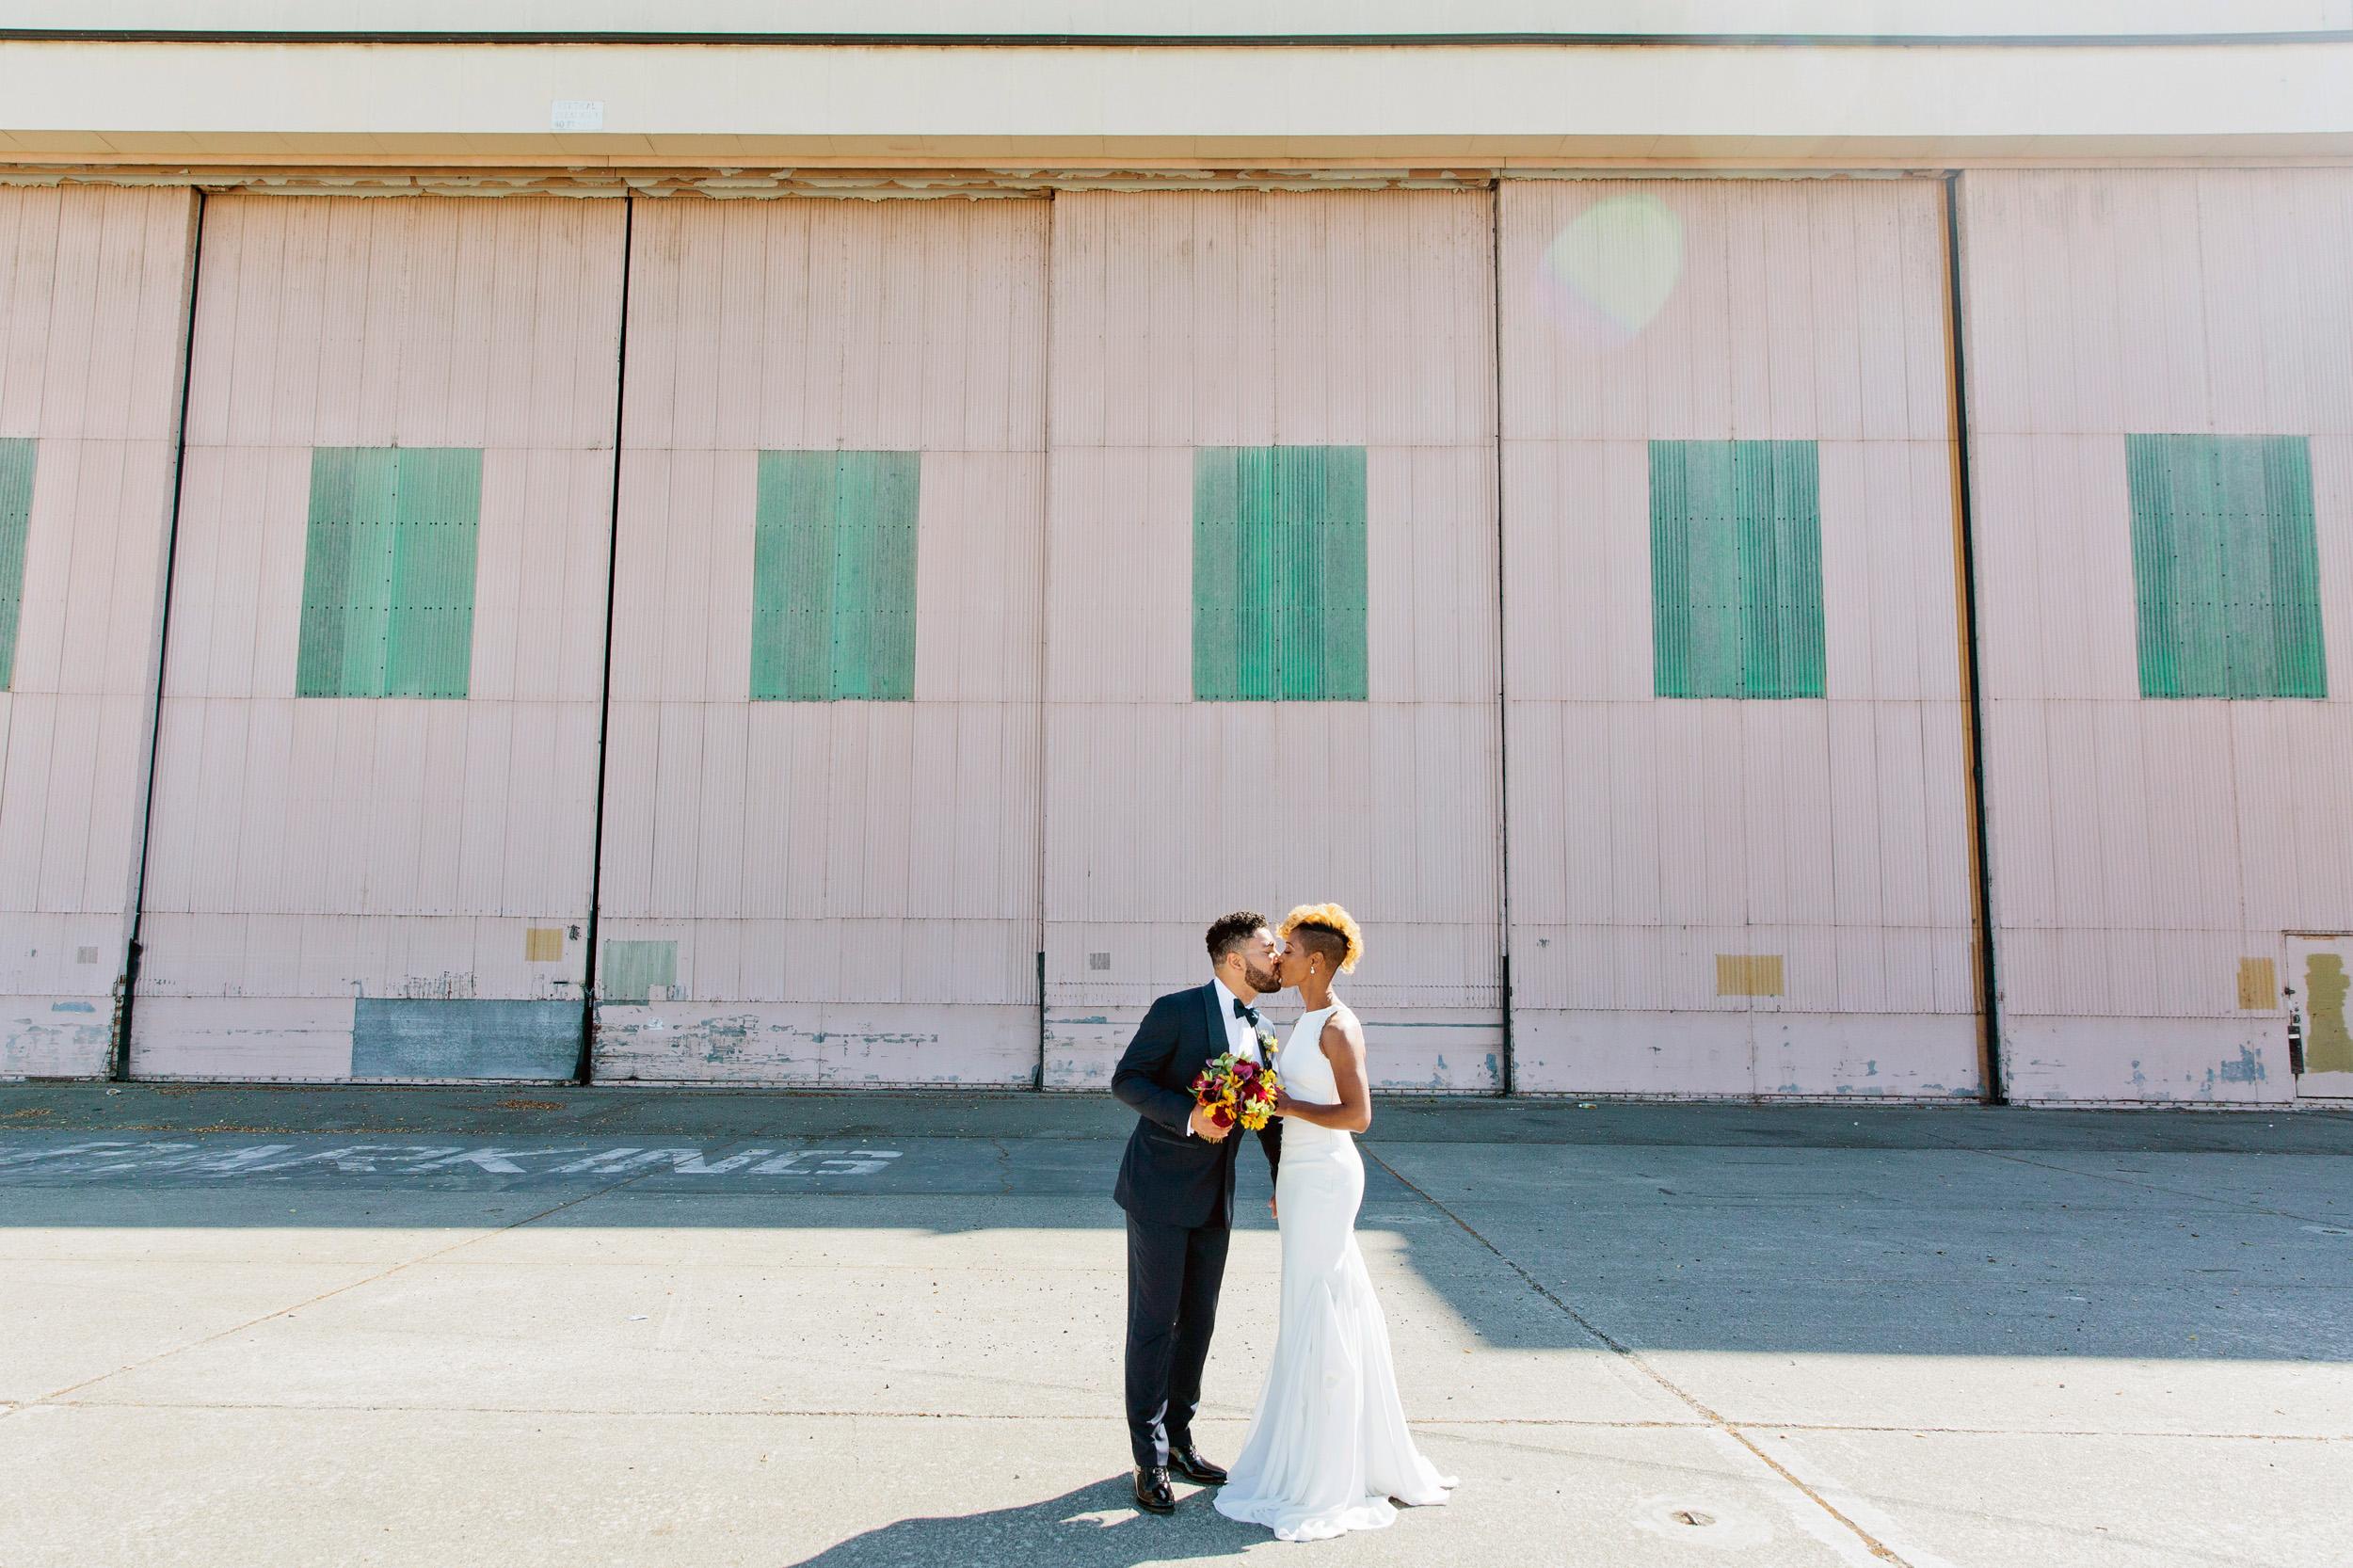 Alameda-Rockwall-Winery-Wedding-001.JPG